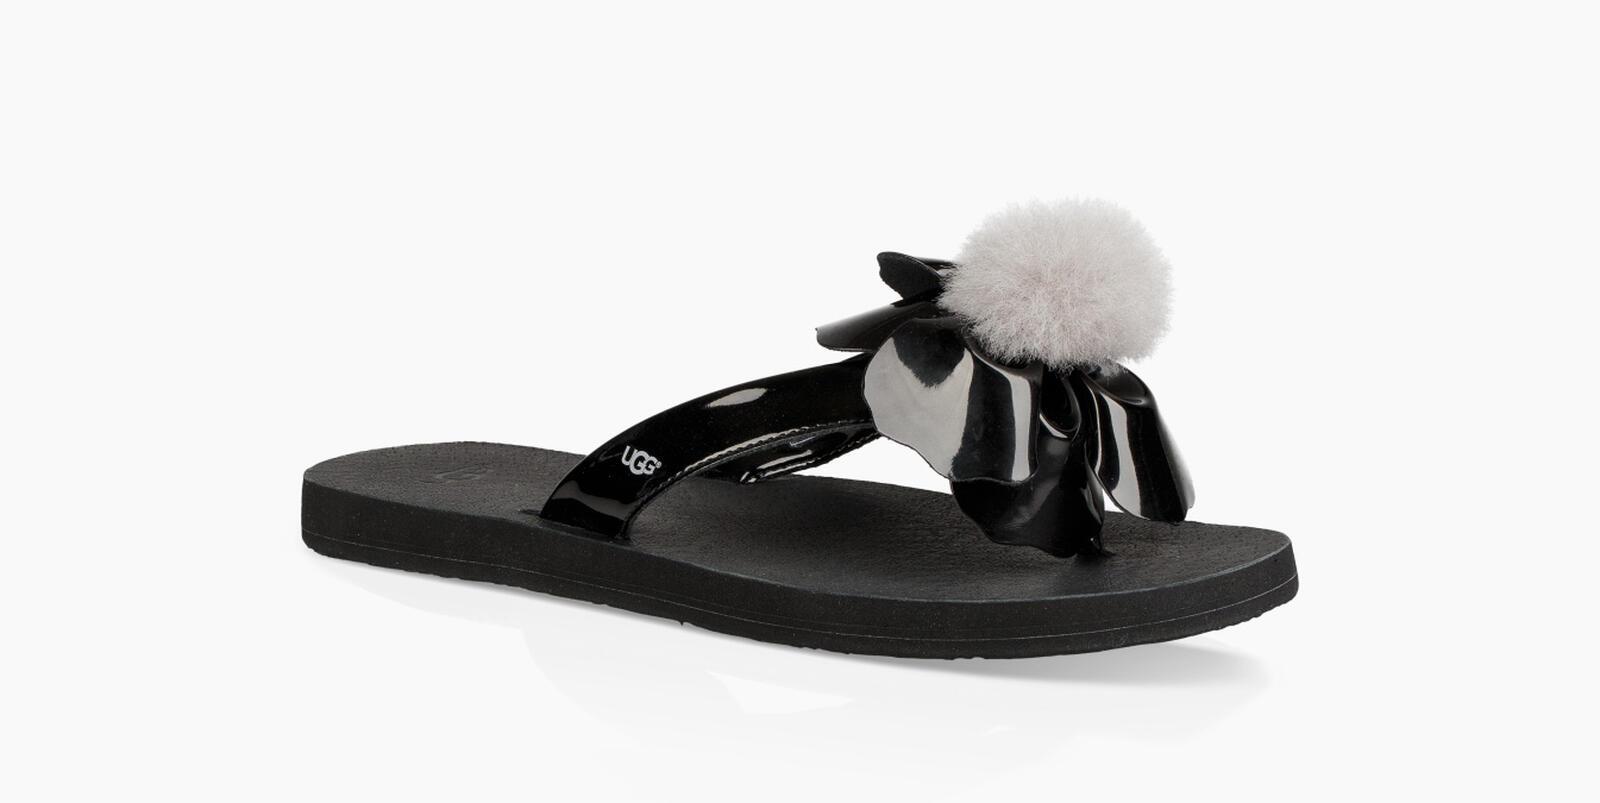 Poppy Flip Flop